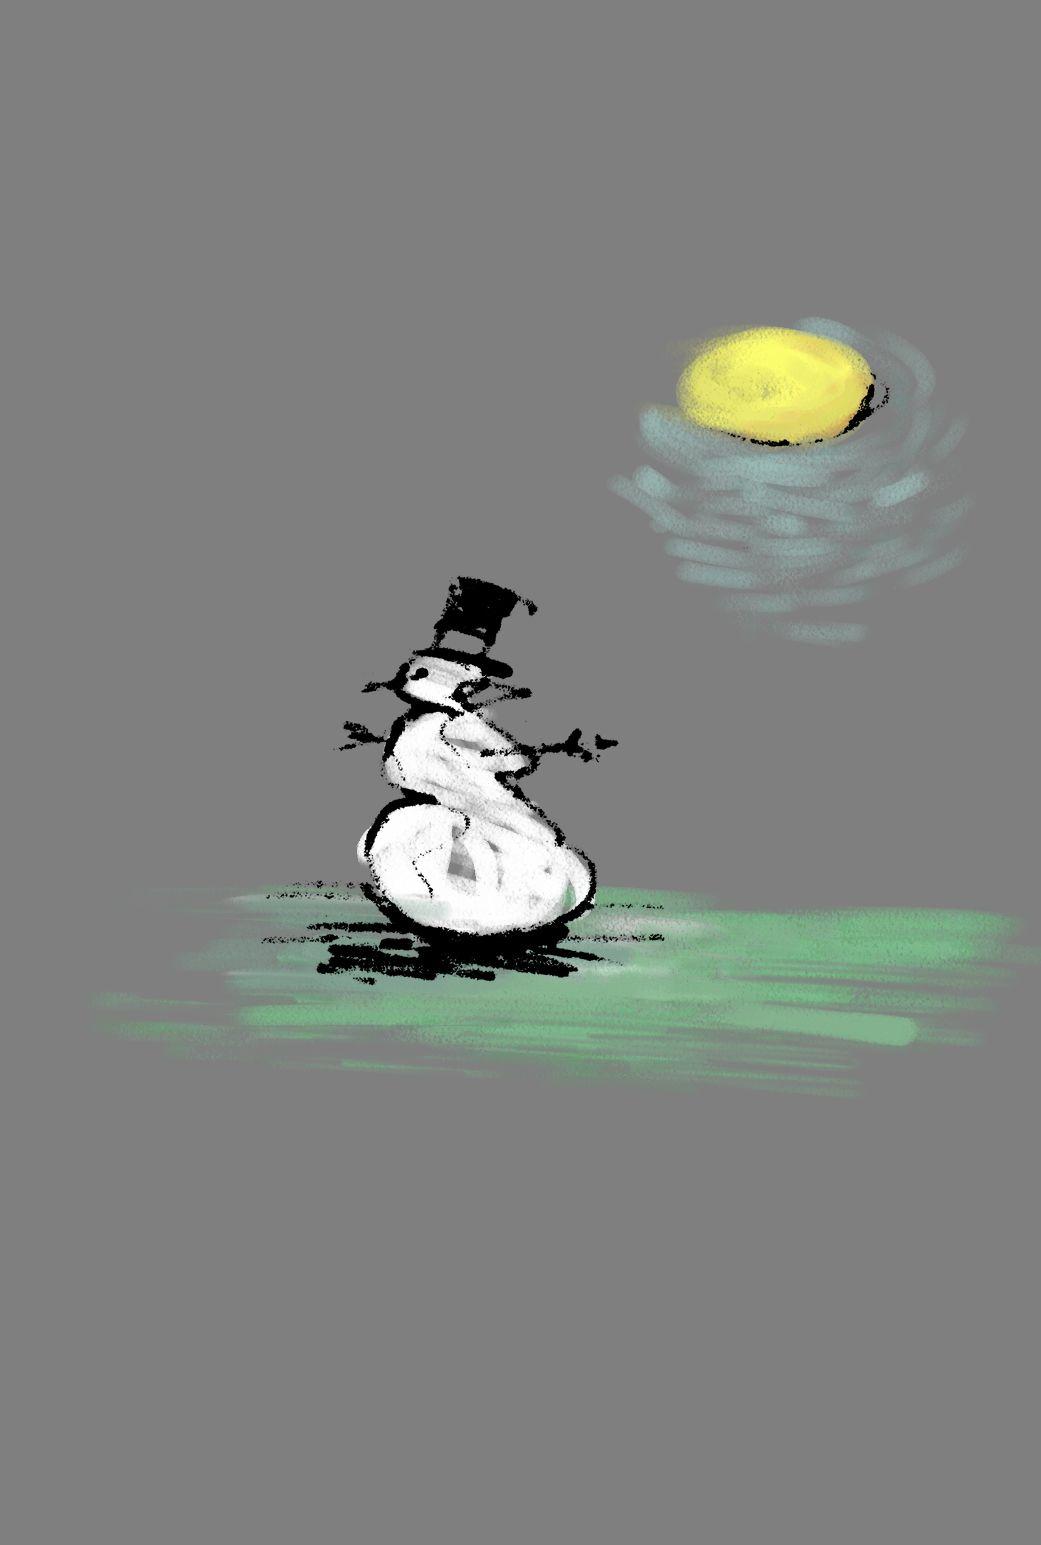 [defiant_snowman]